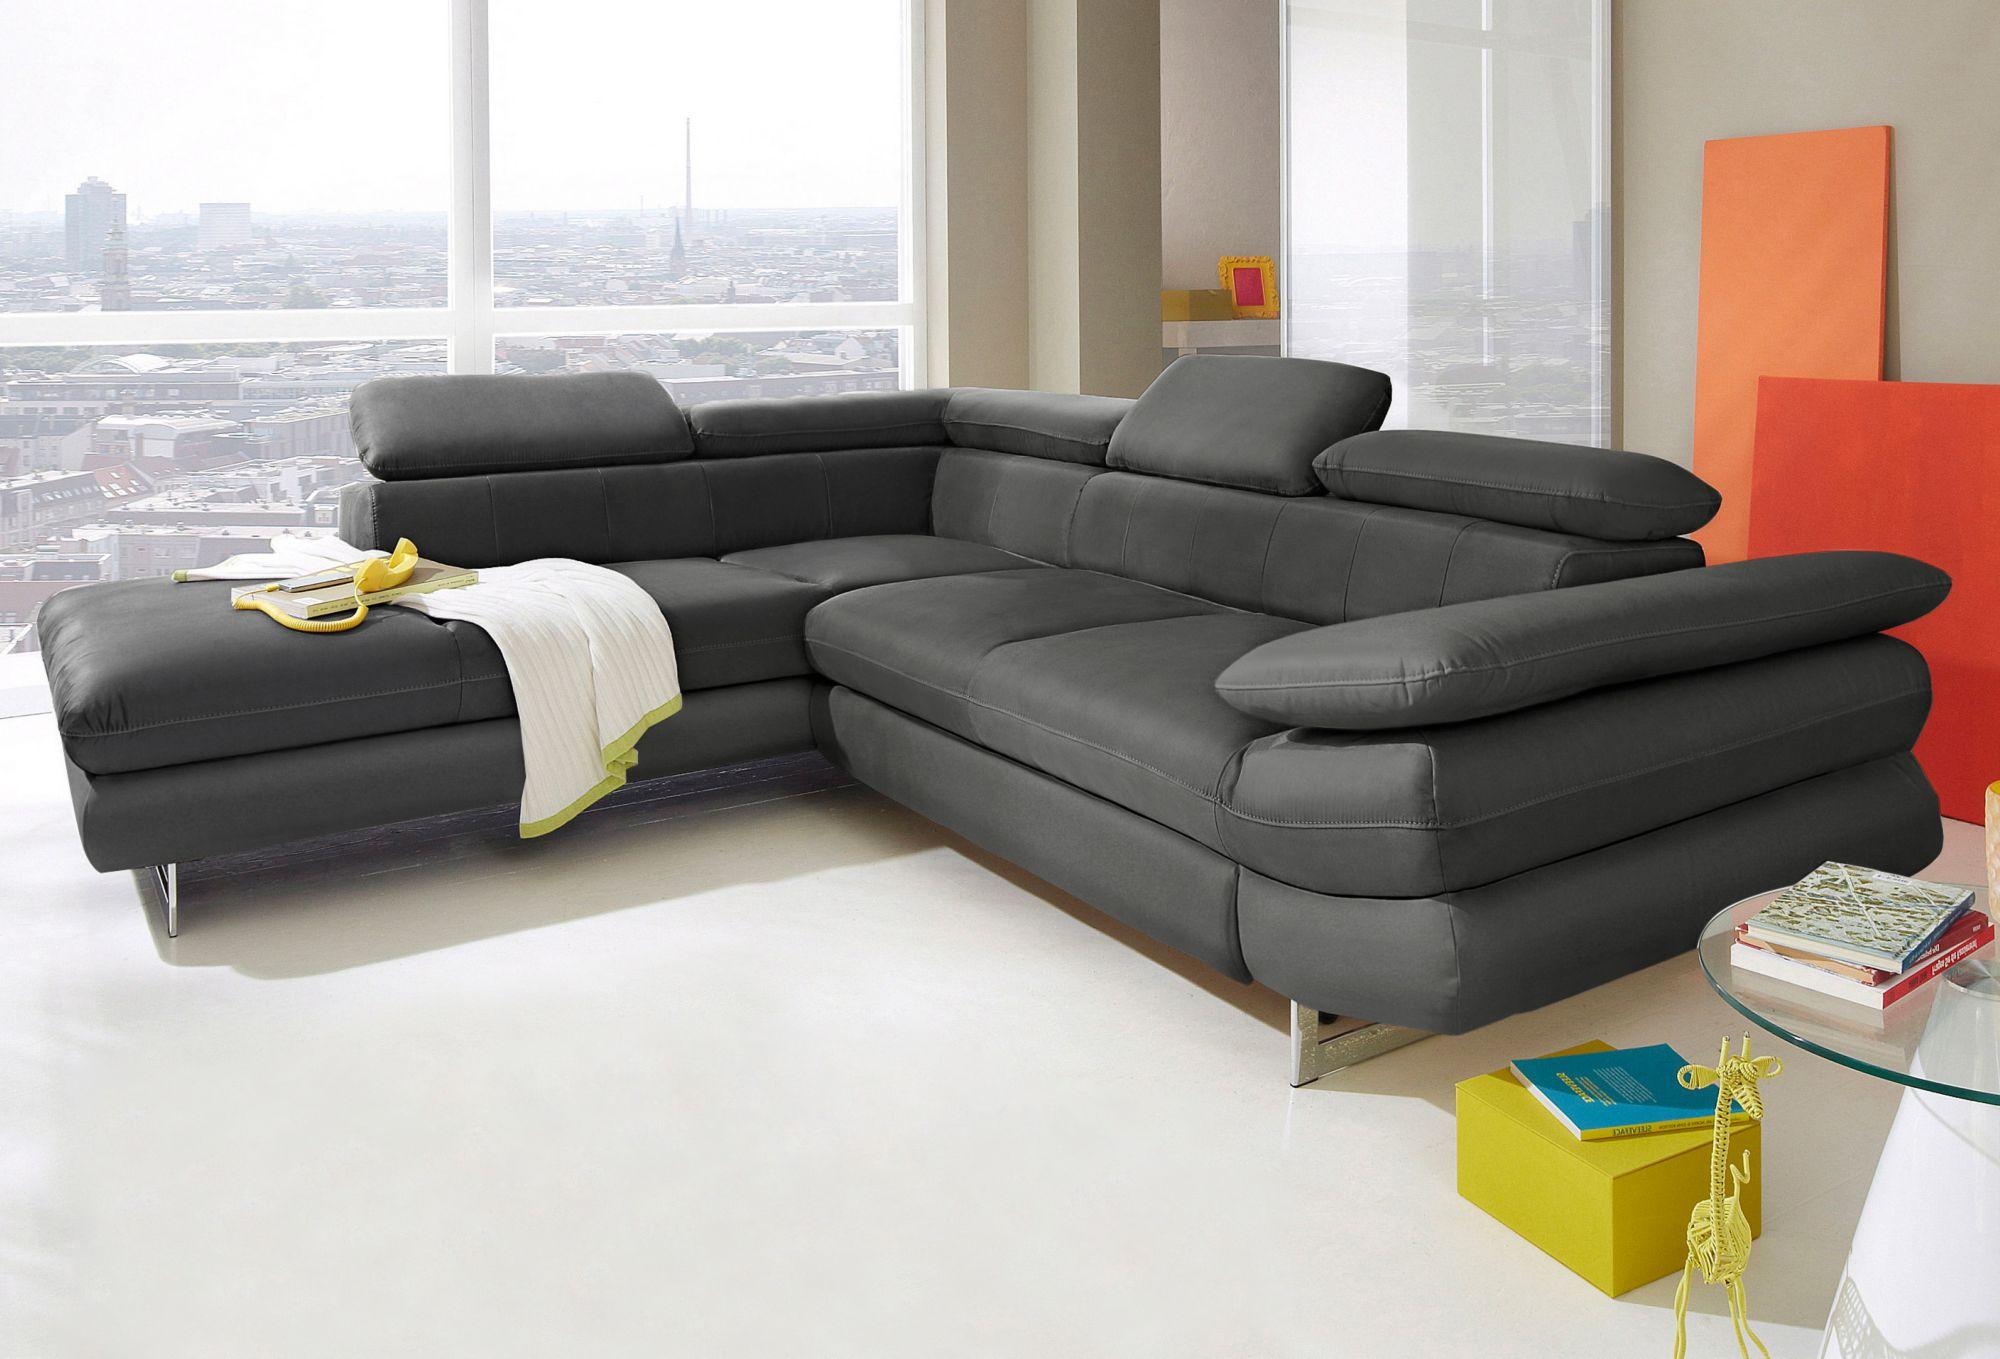 inosign polsterecke wahlweise mit bettfunktion schwab. Black Bedroom Furniture Sets. Home Design Ideas